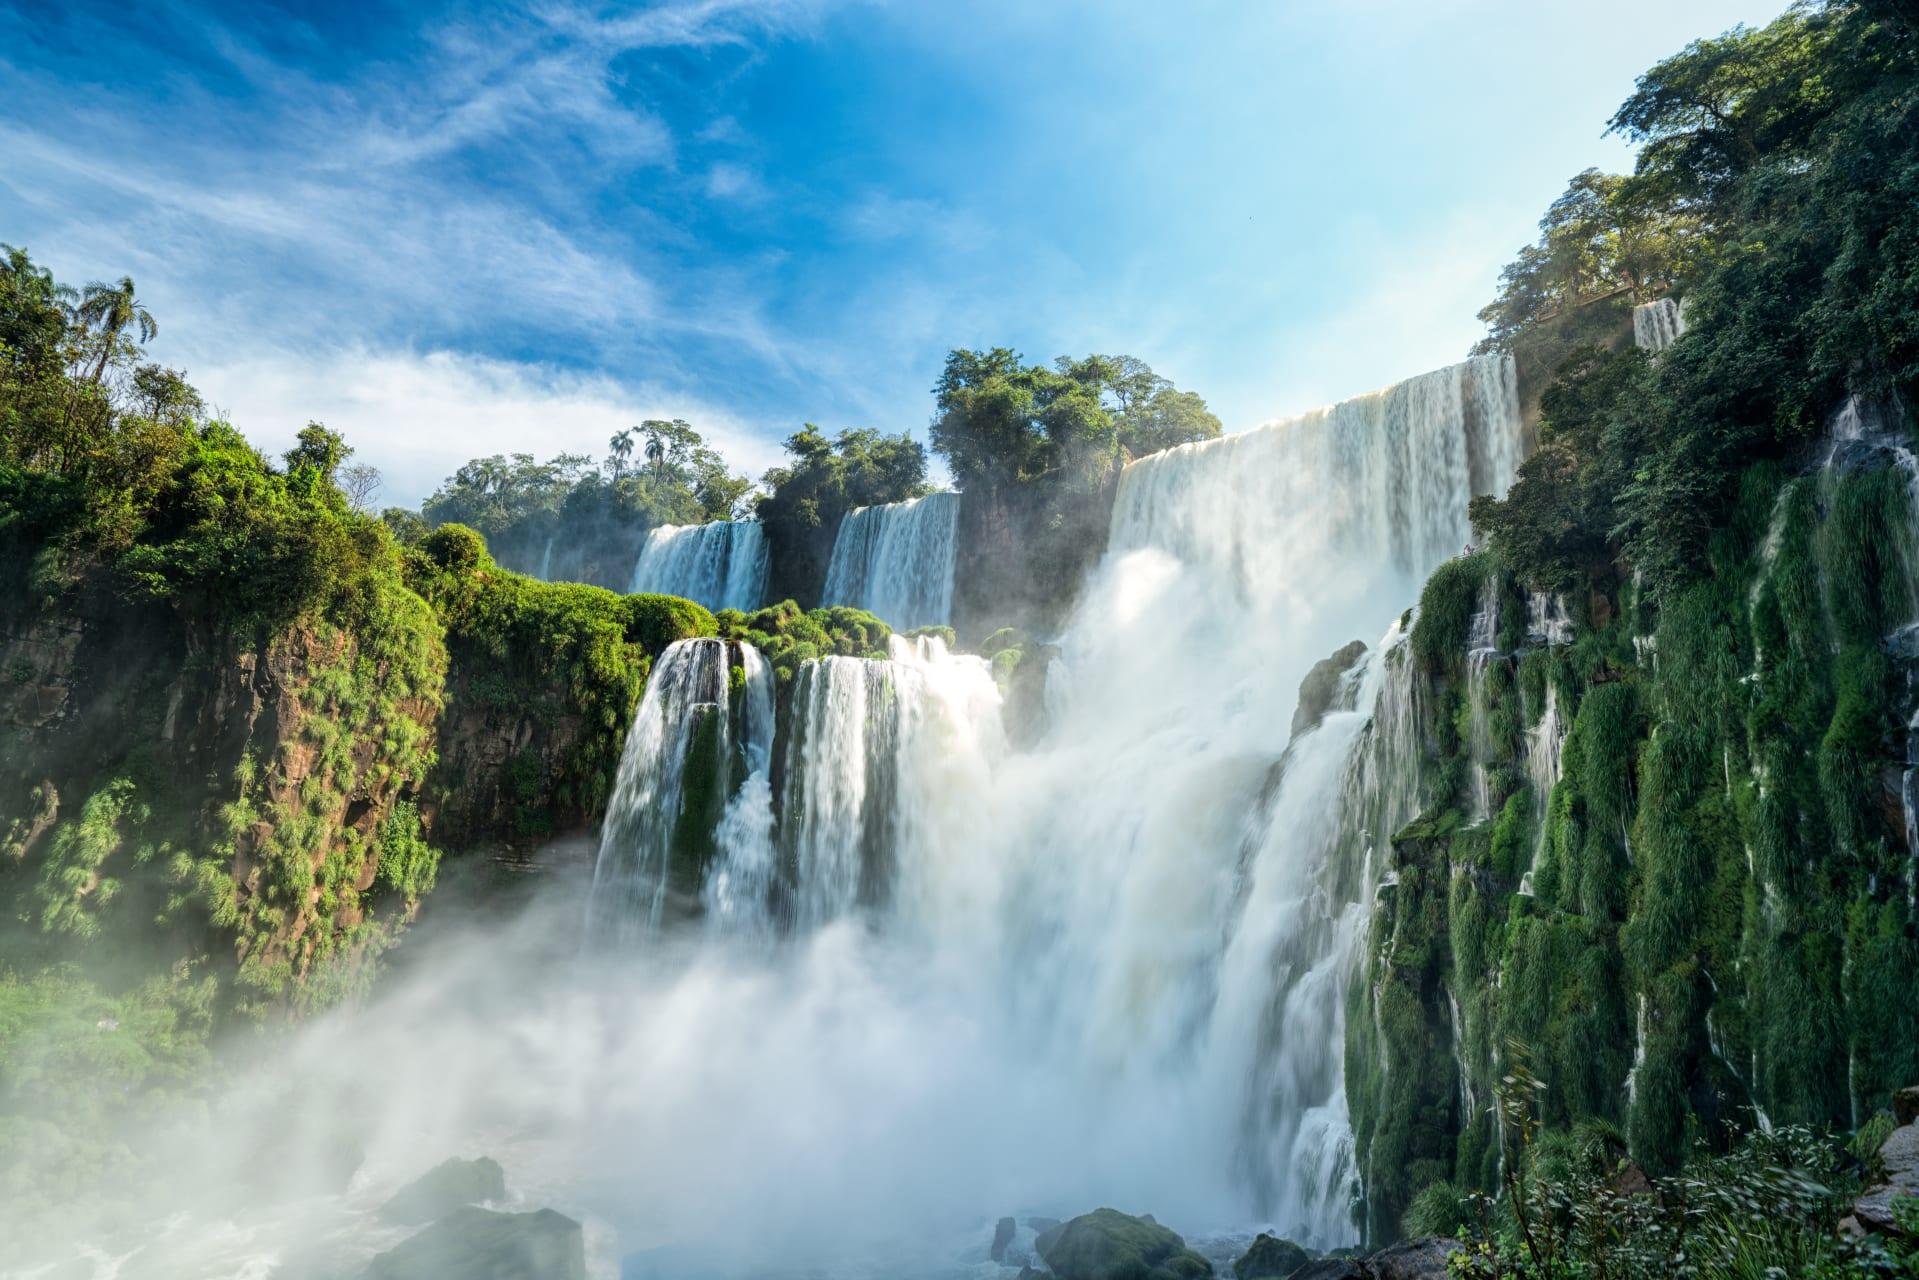 Iguazu Falls - Iguazu Falls: A Wonder of the Natural World